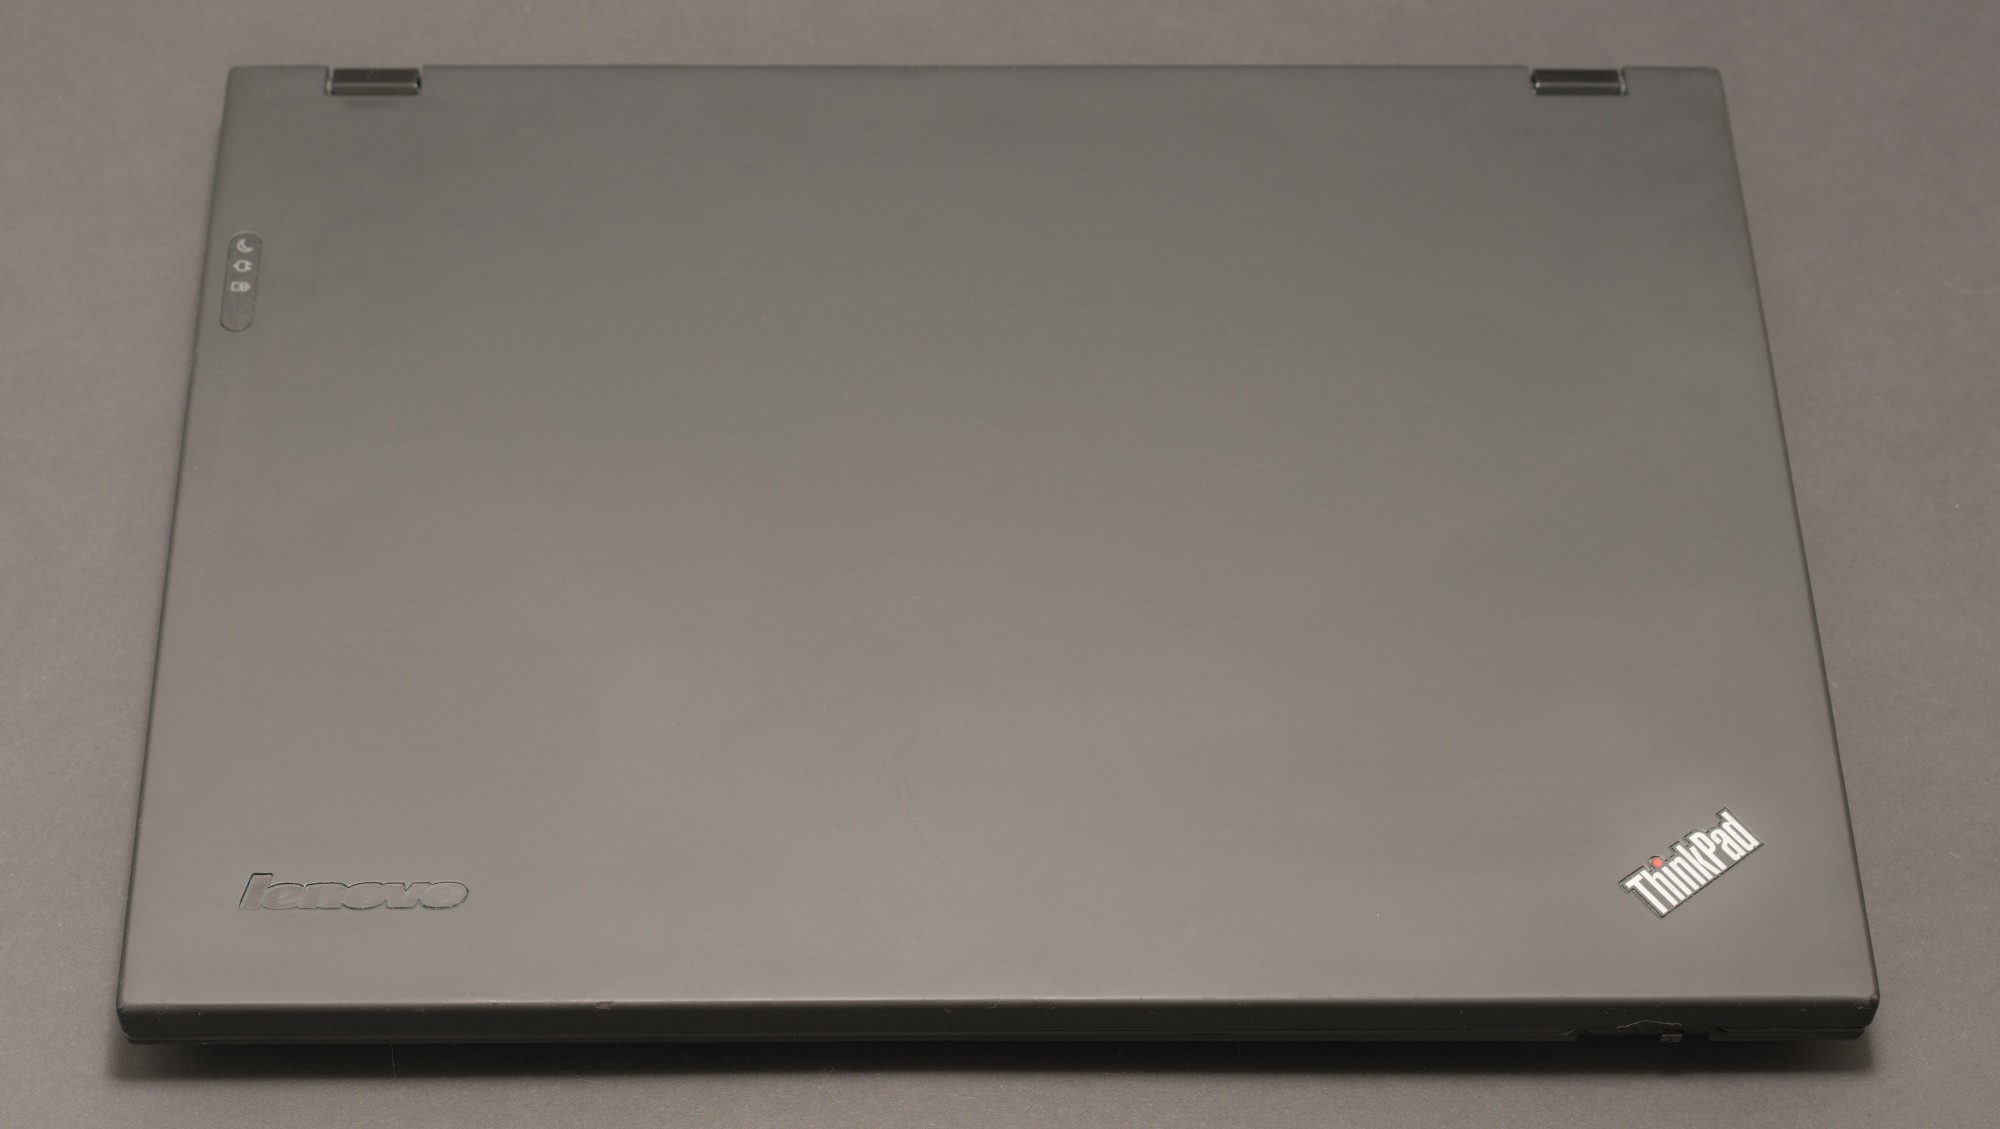 Древности: десять лет эволюции ноутбуков на примере ThinkPad X301